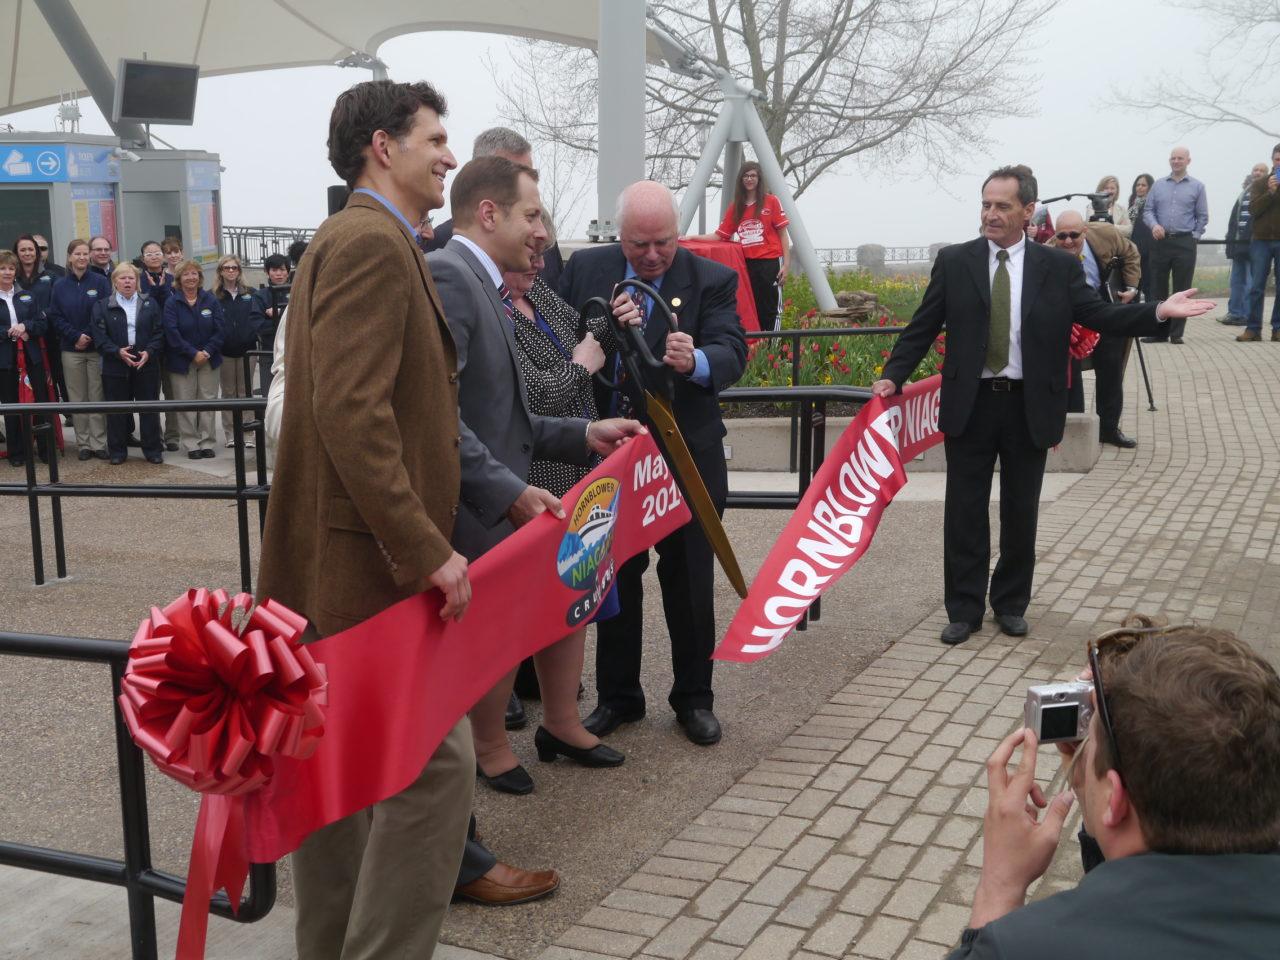 Hornblower Niagara Cruises Unveiling!